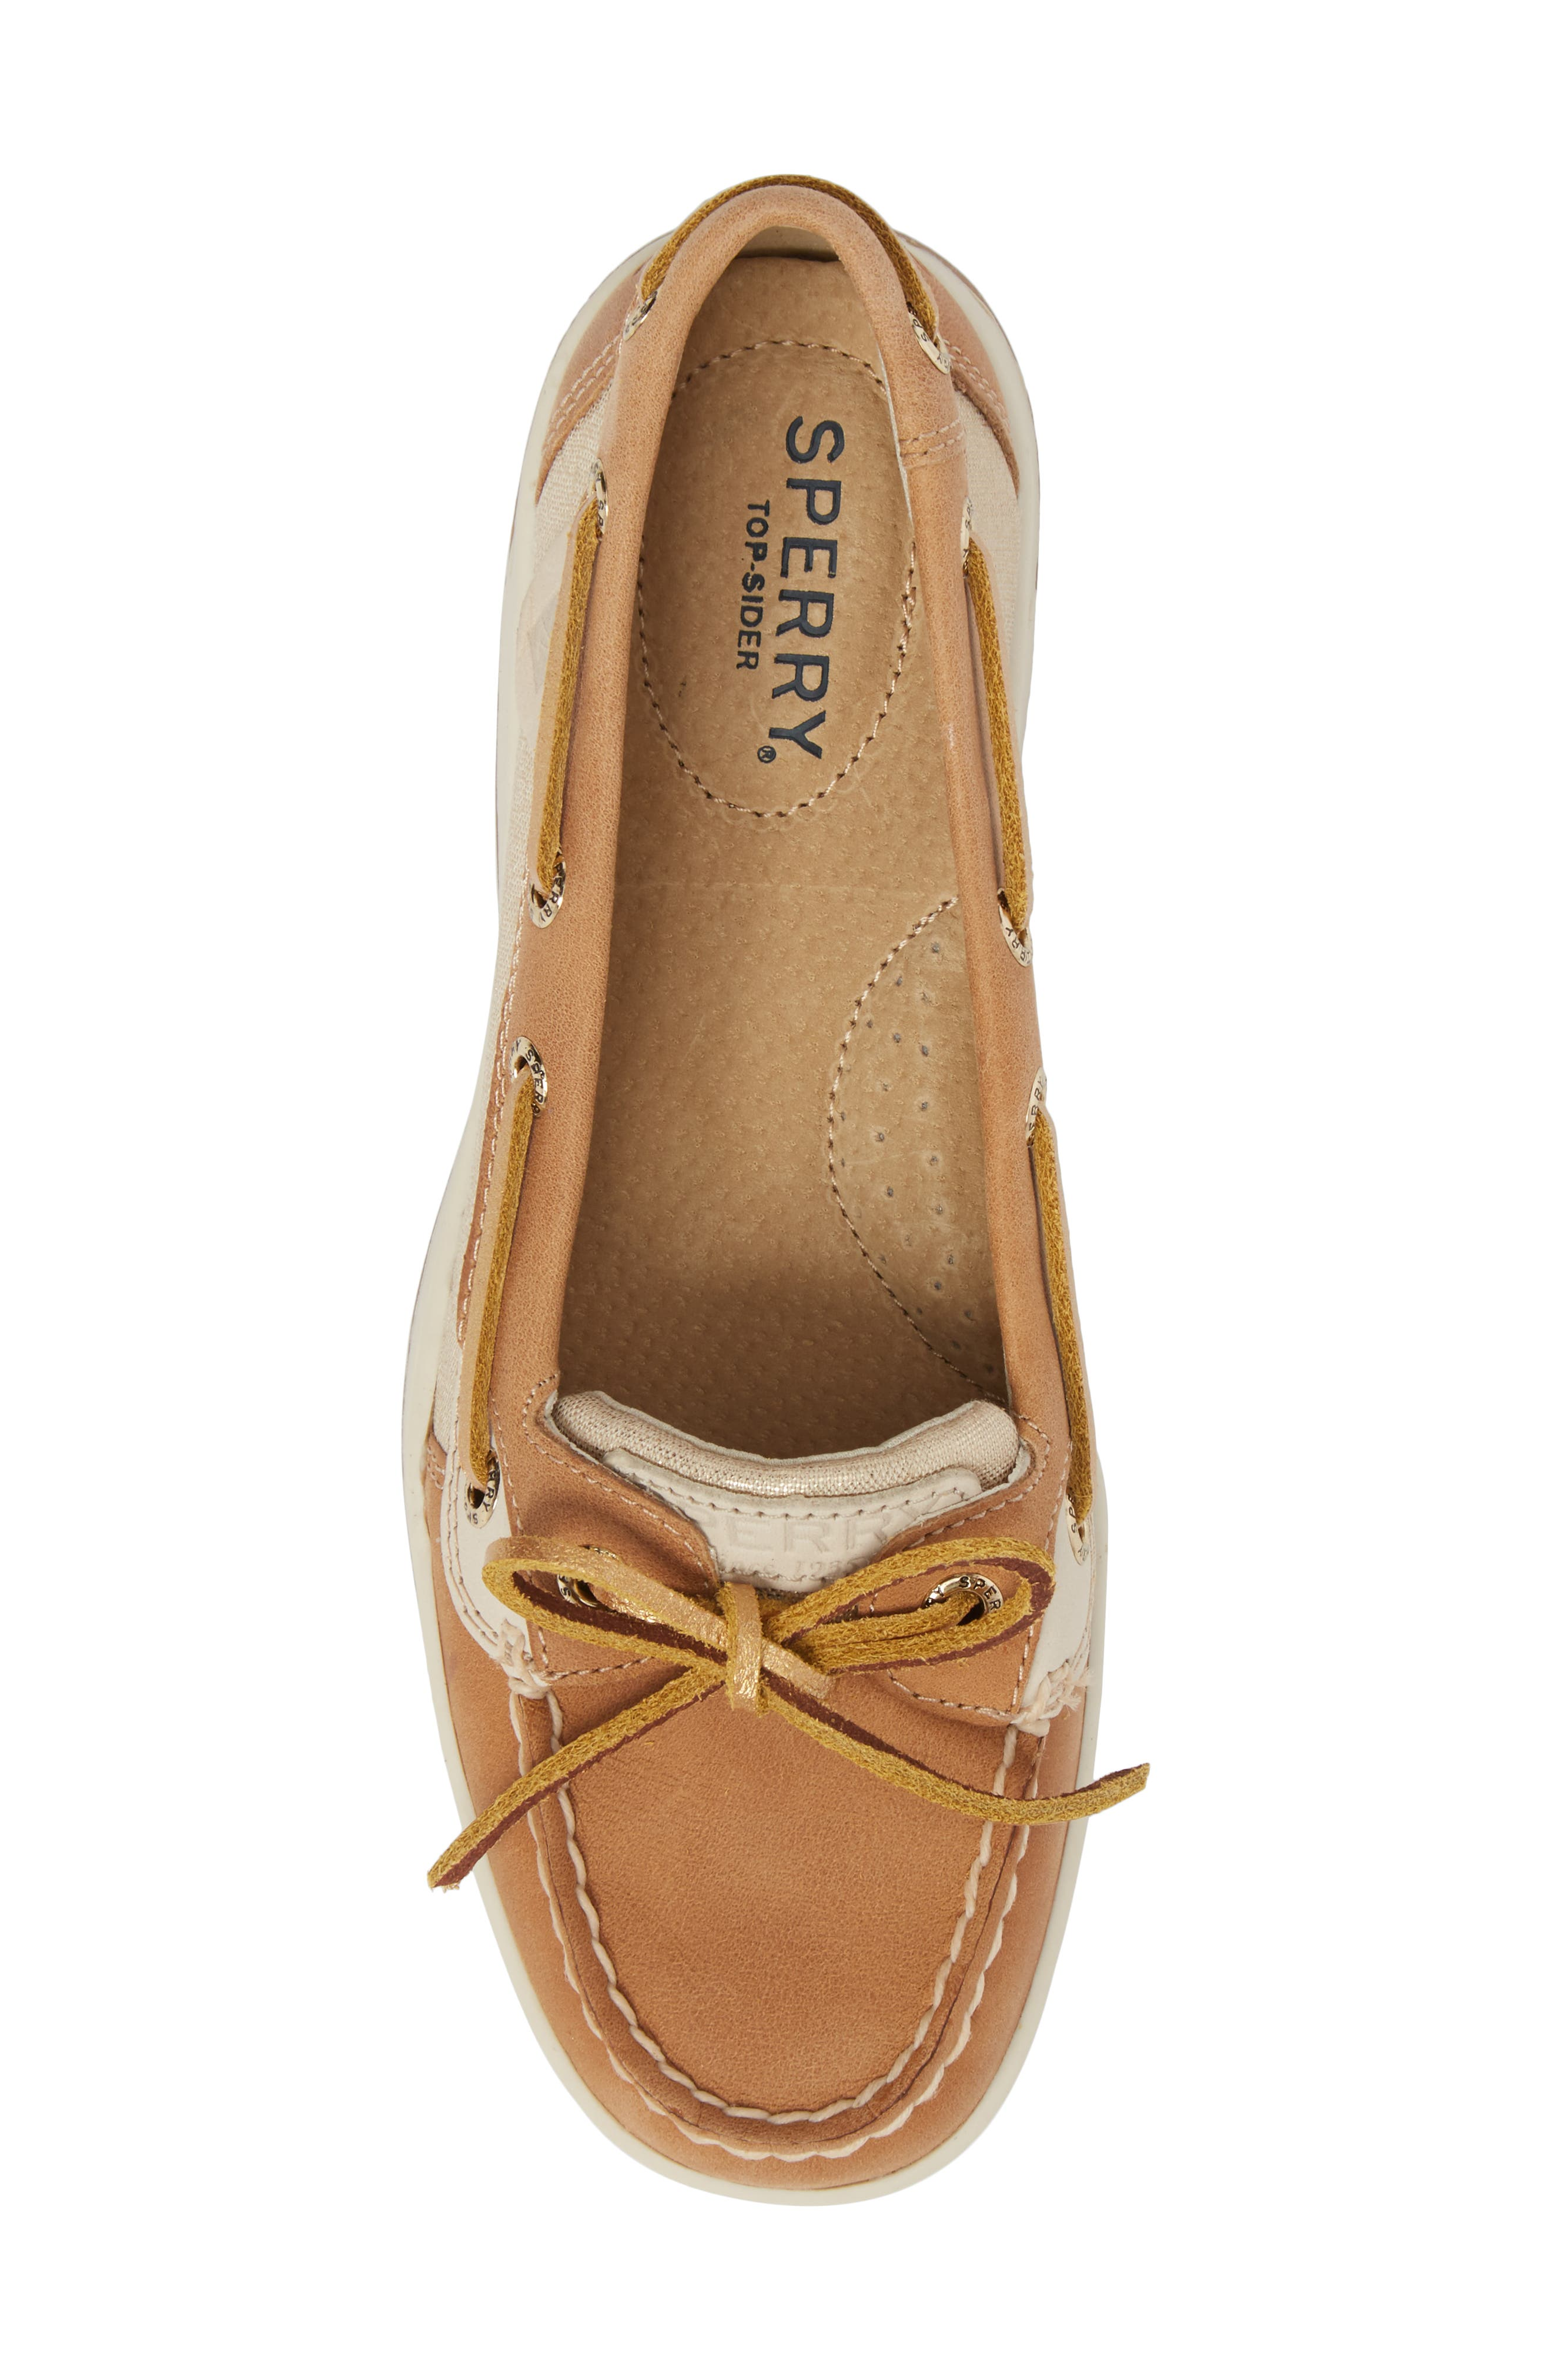 'Angelfish' Boat Shoe,                             Alternate thumbnail 3, color,                             Linen Metallic Leather